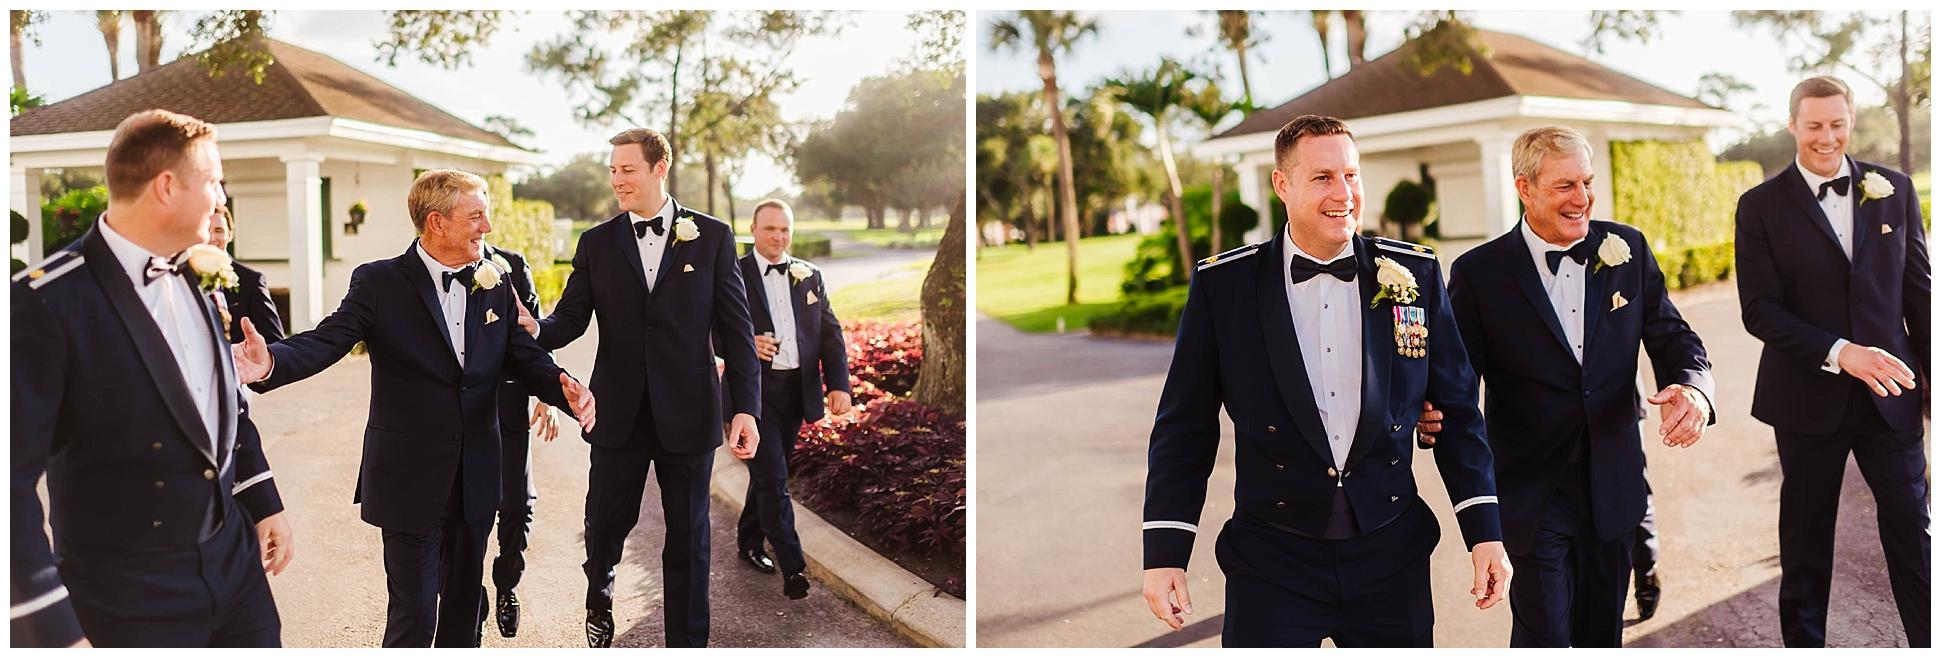 tampa-wedding-photographer-sleeves-palma-ceia-country-club-golf-course-sunset-luxury_0080.jpg